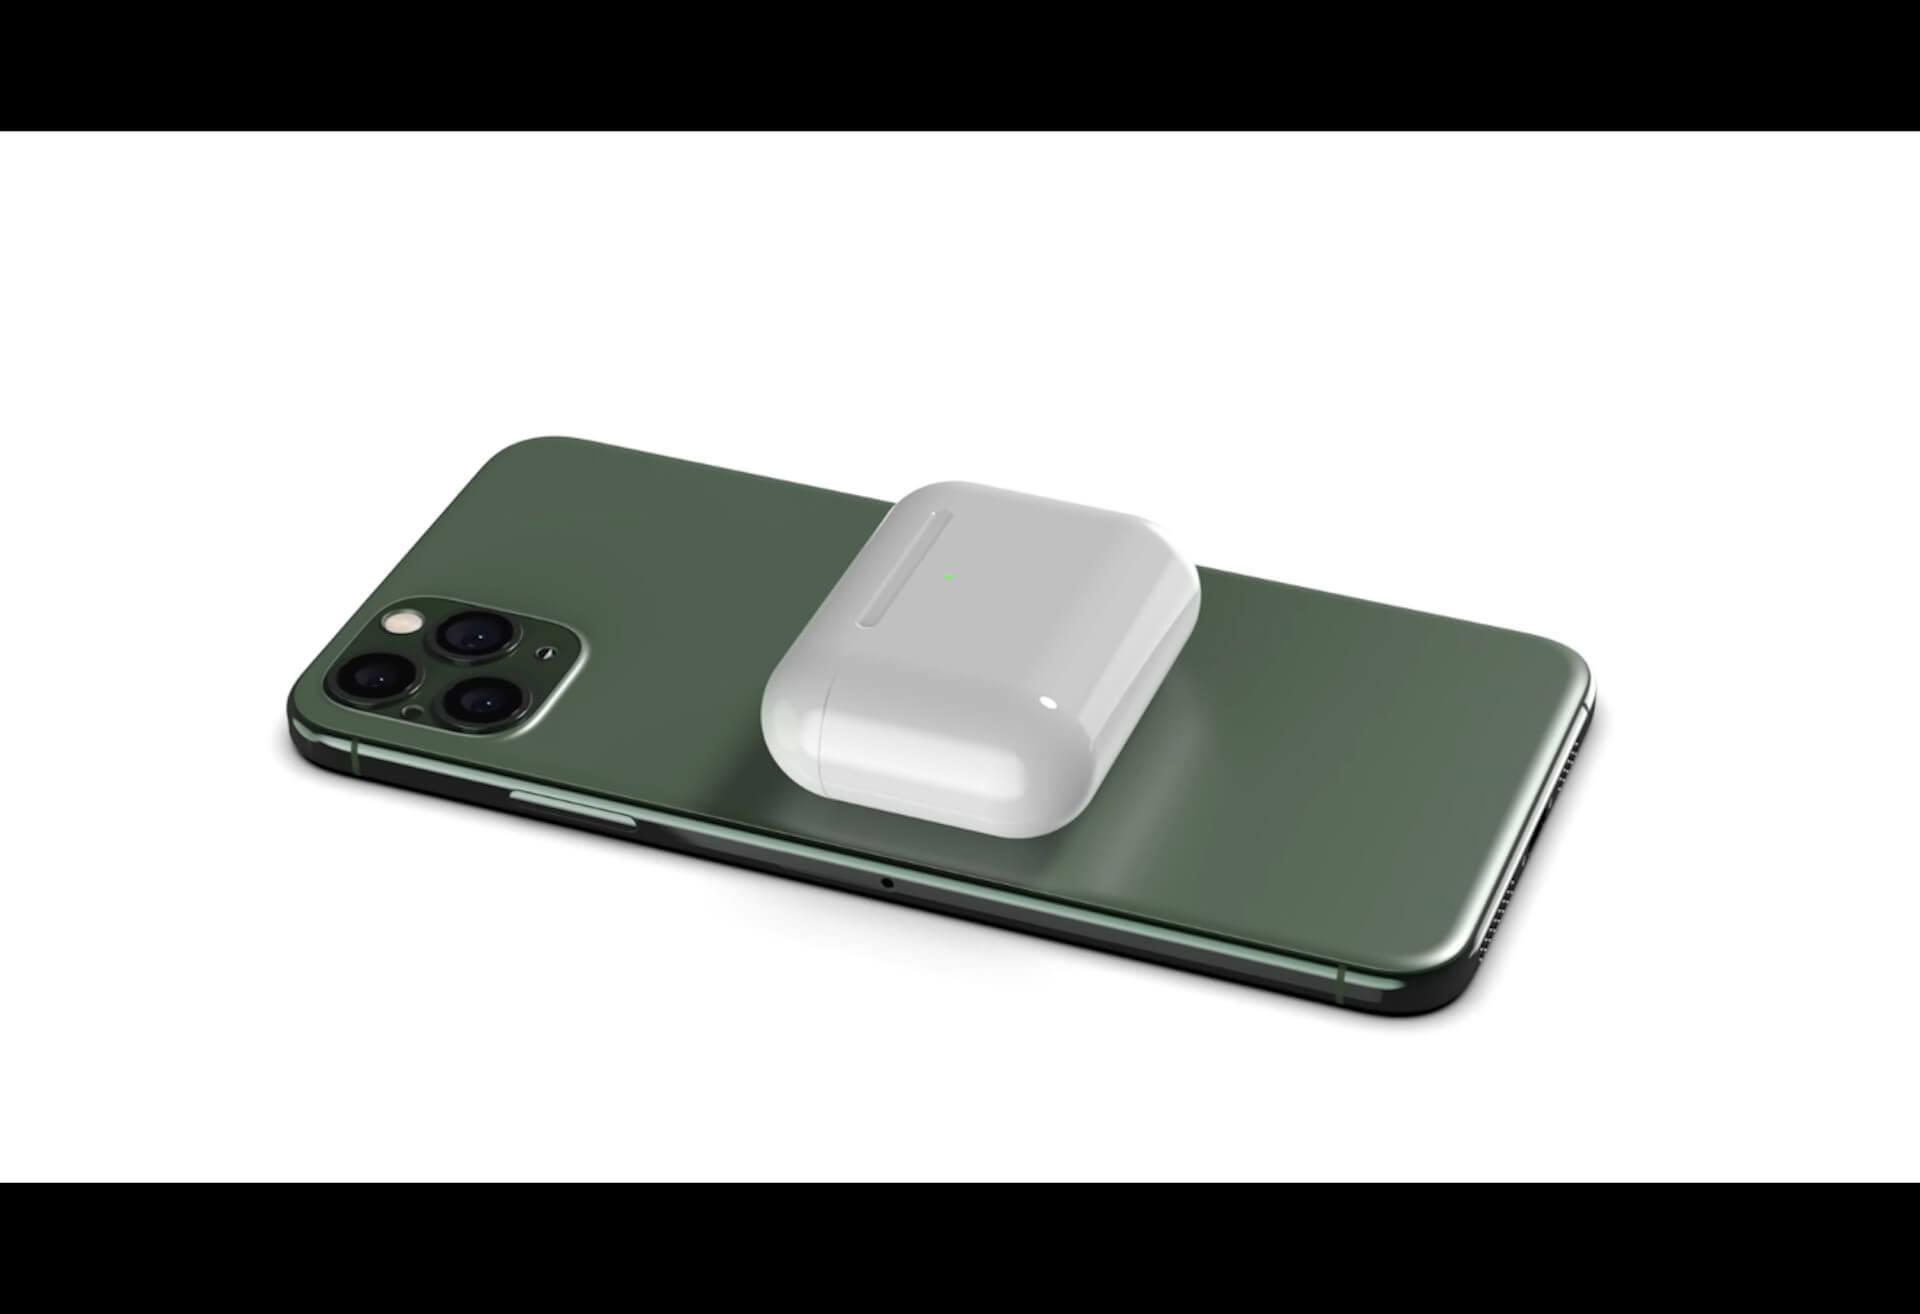 iPhone 12シリーズはやはりデバイス同士で双方向充電できる?シャーシ部分にマグネット搭載か tech200805_iphone12_charge_main